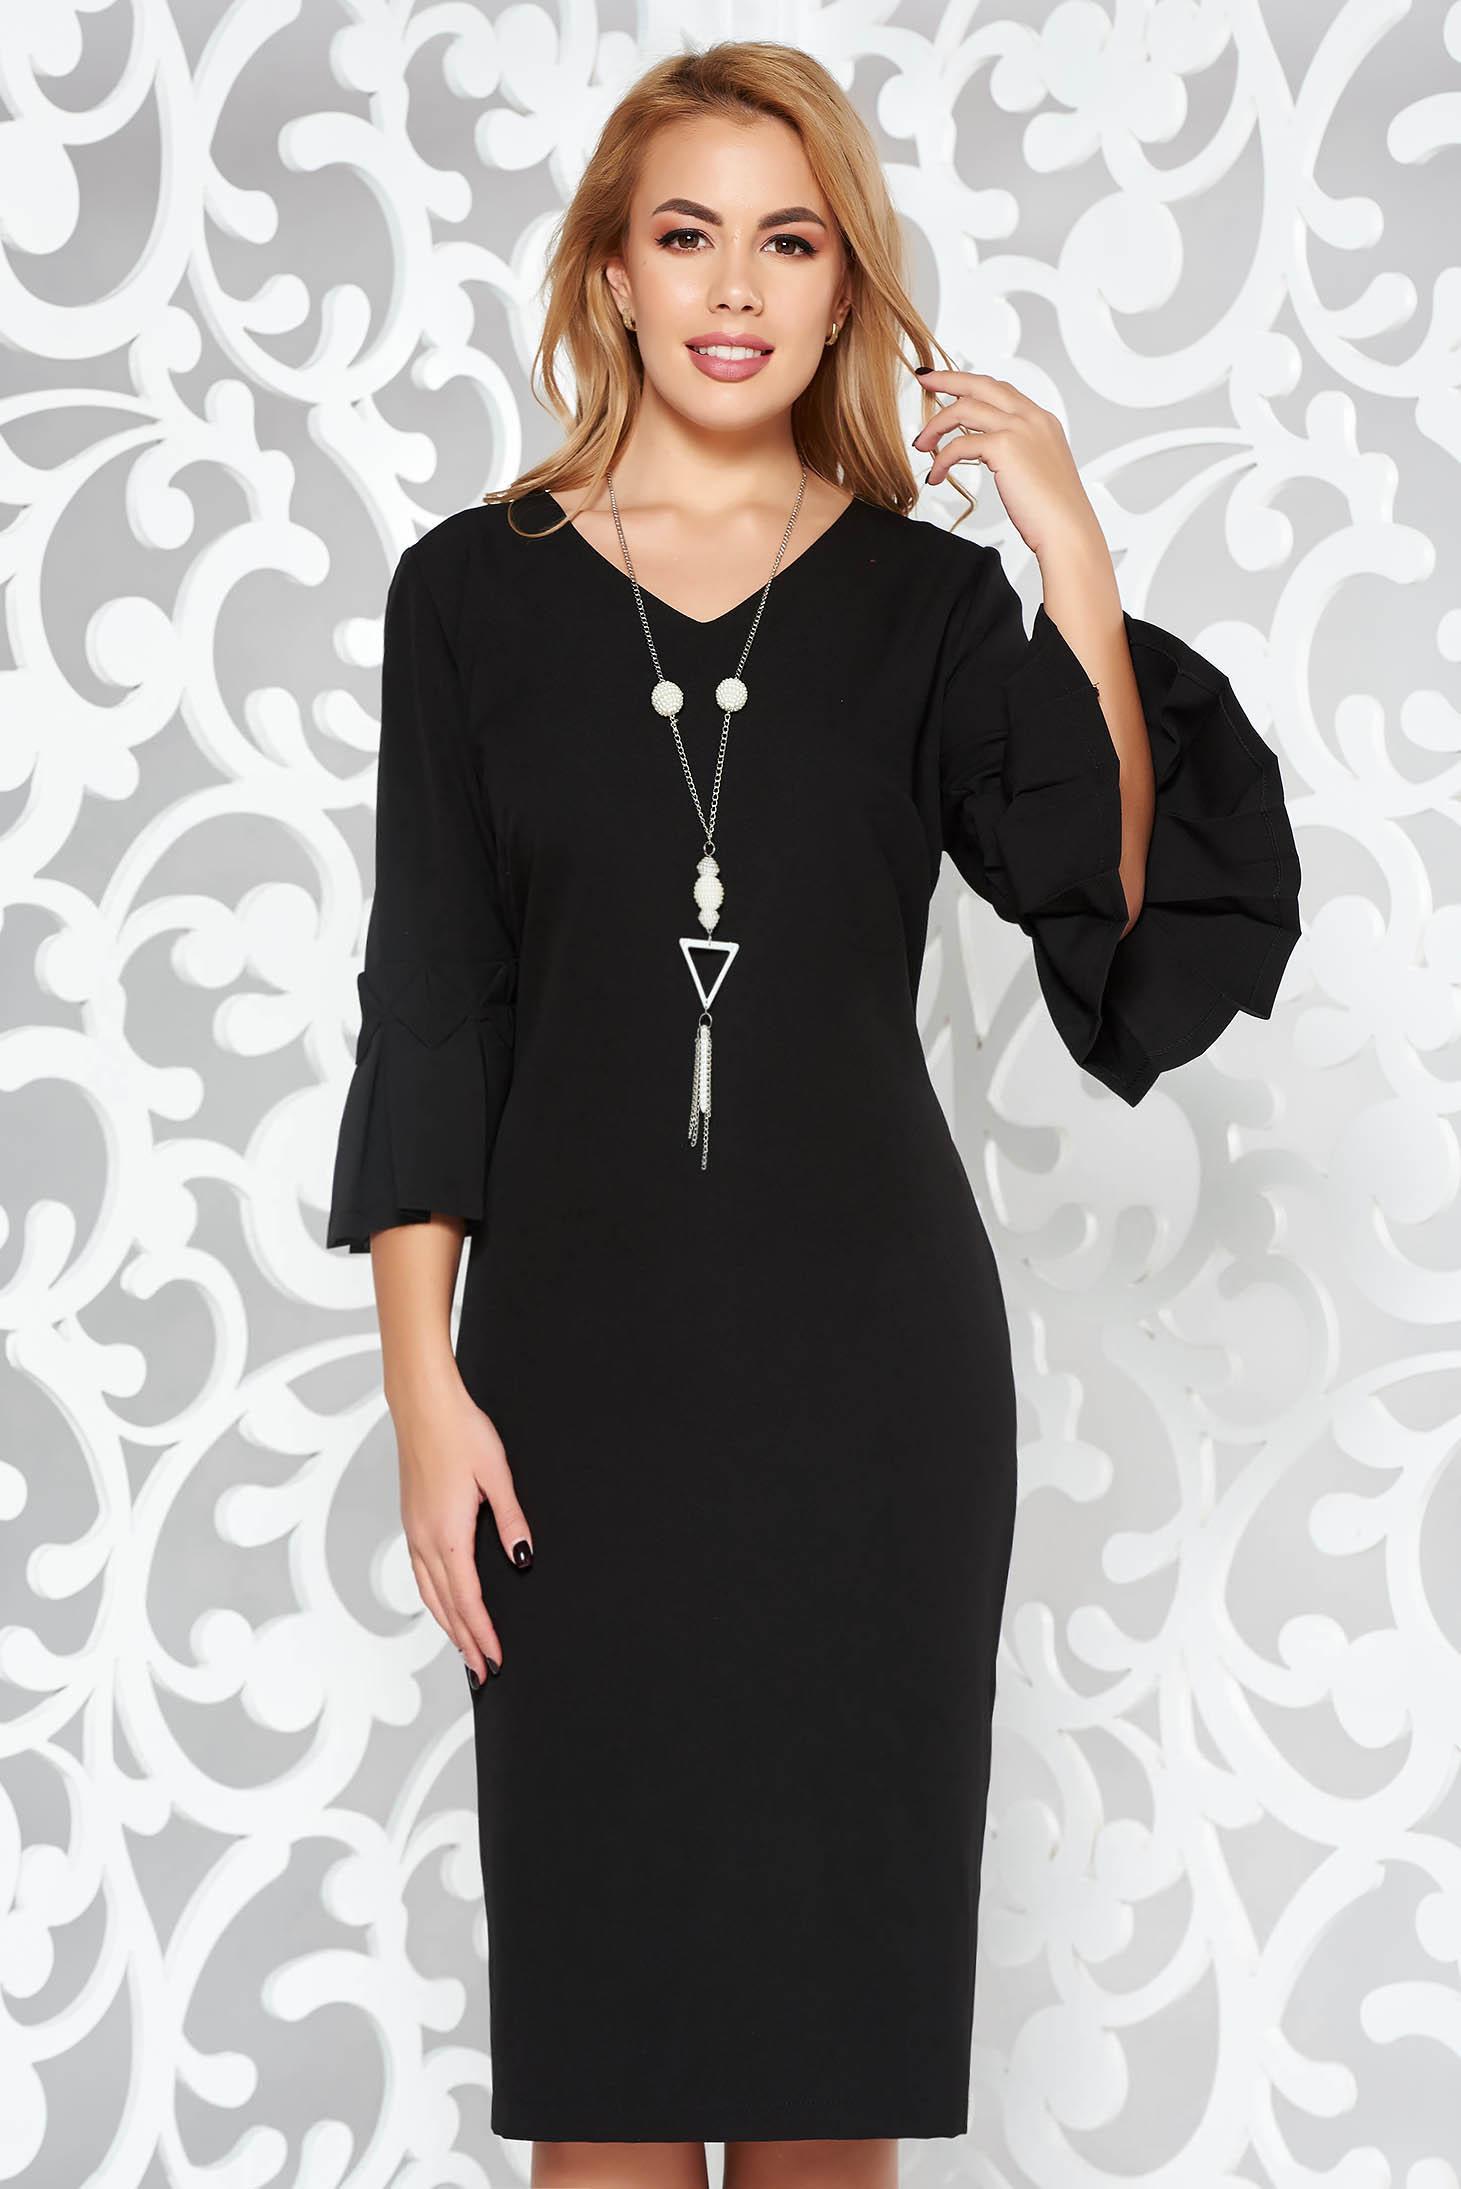 Rochie neagra eleganta tip creion midi din stofa subtire usor elastica accesoriu tip colier